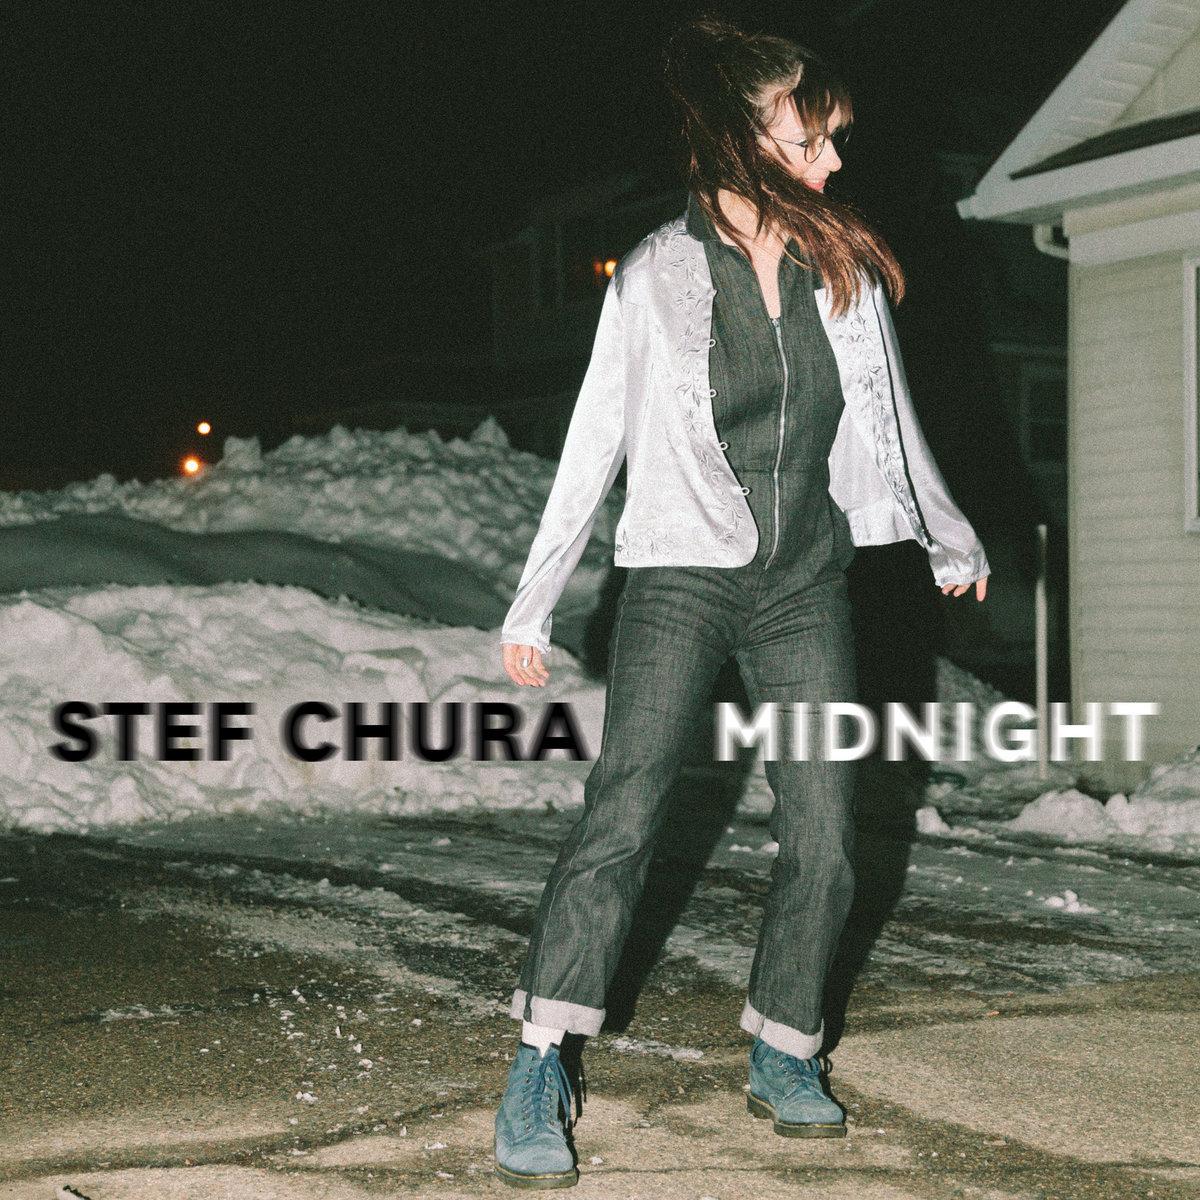 Stef Chura - Midnight LP